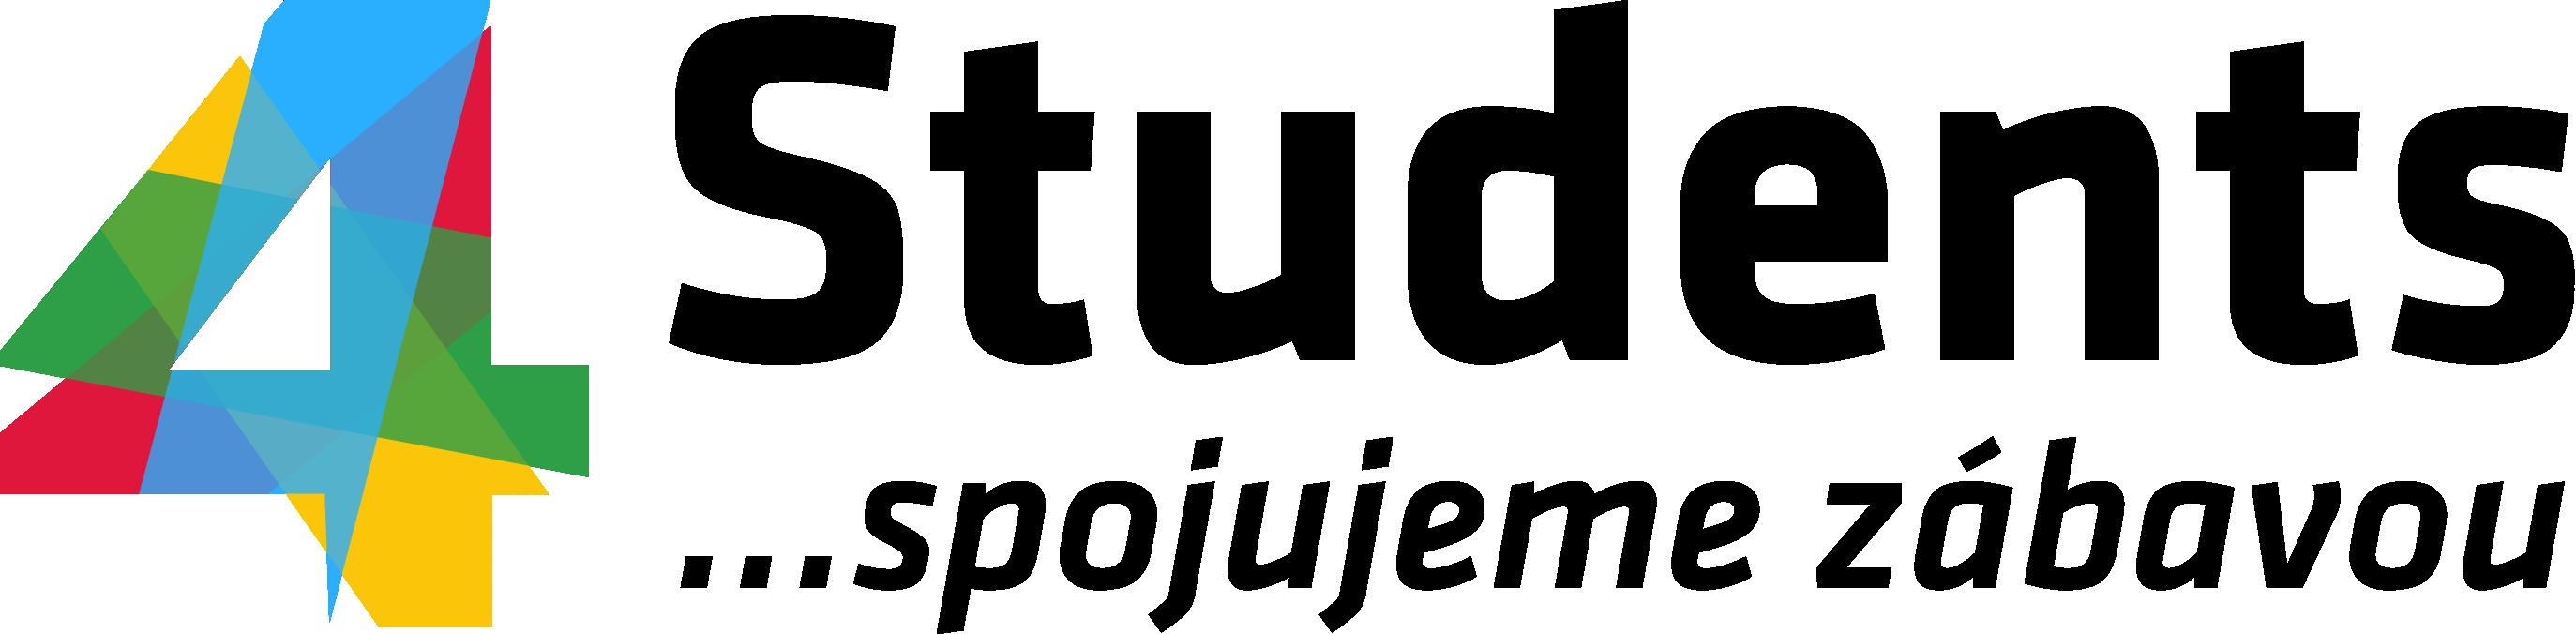 Logo-4students-bile